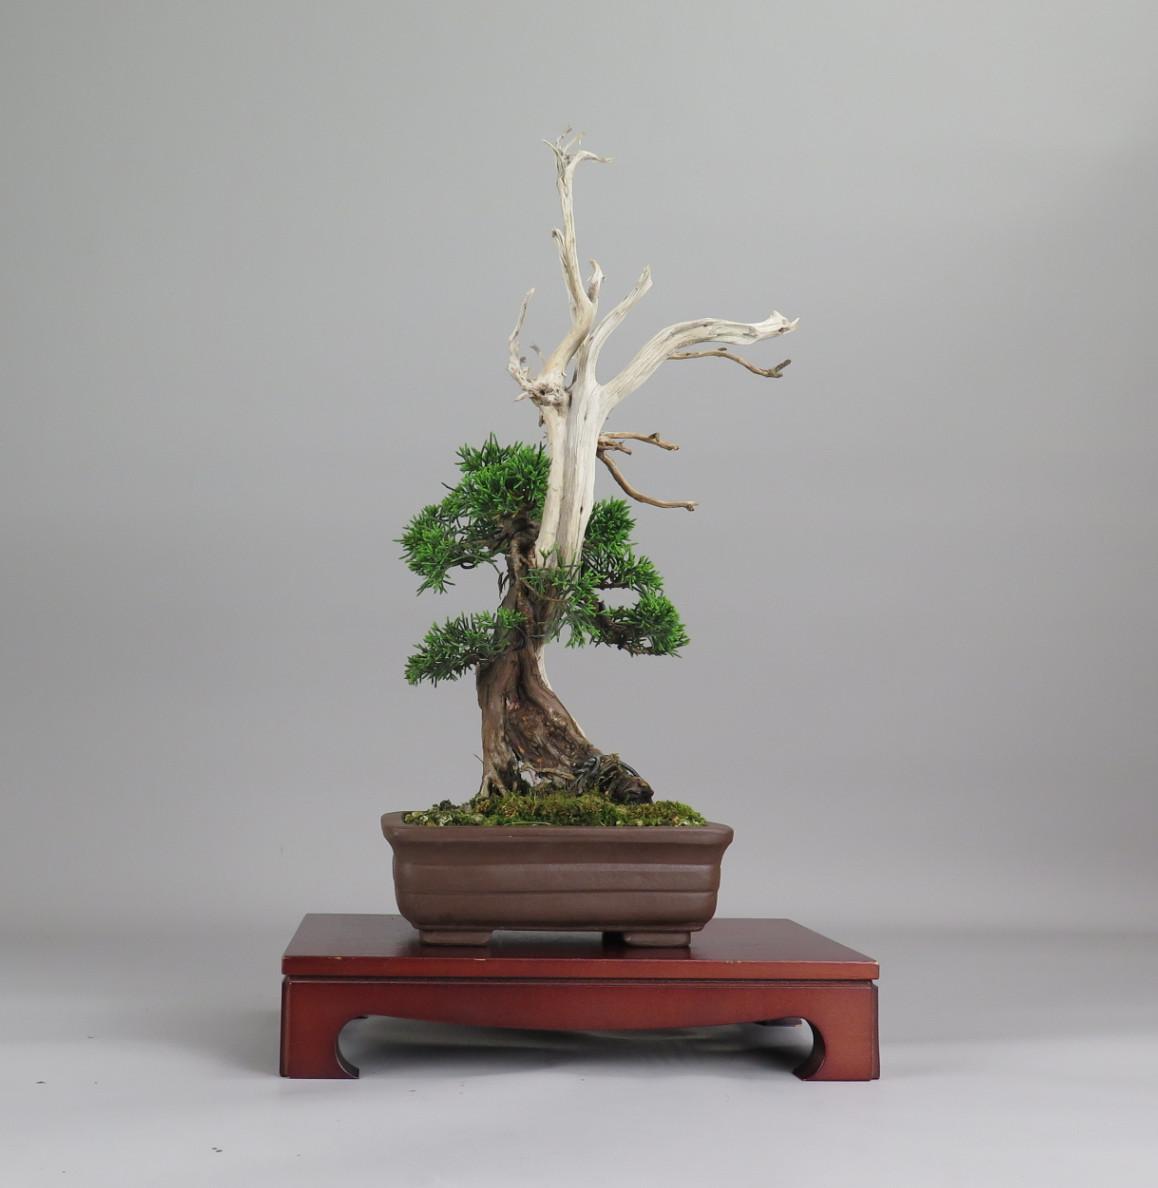 Bonsai de juniperus chinensis, espalda